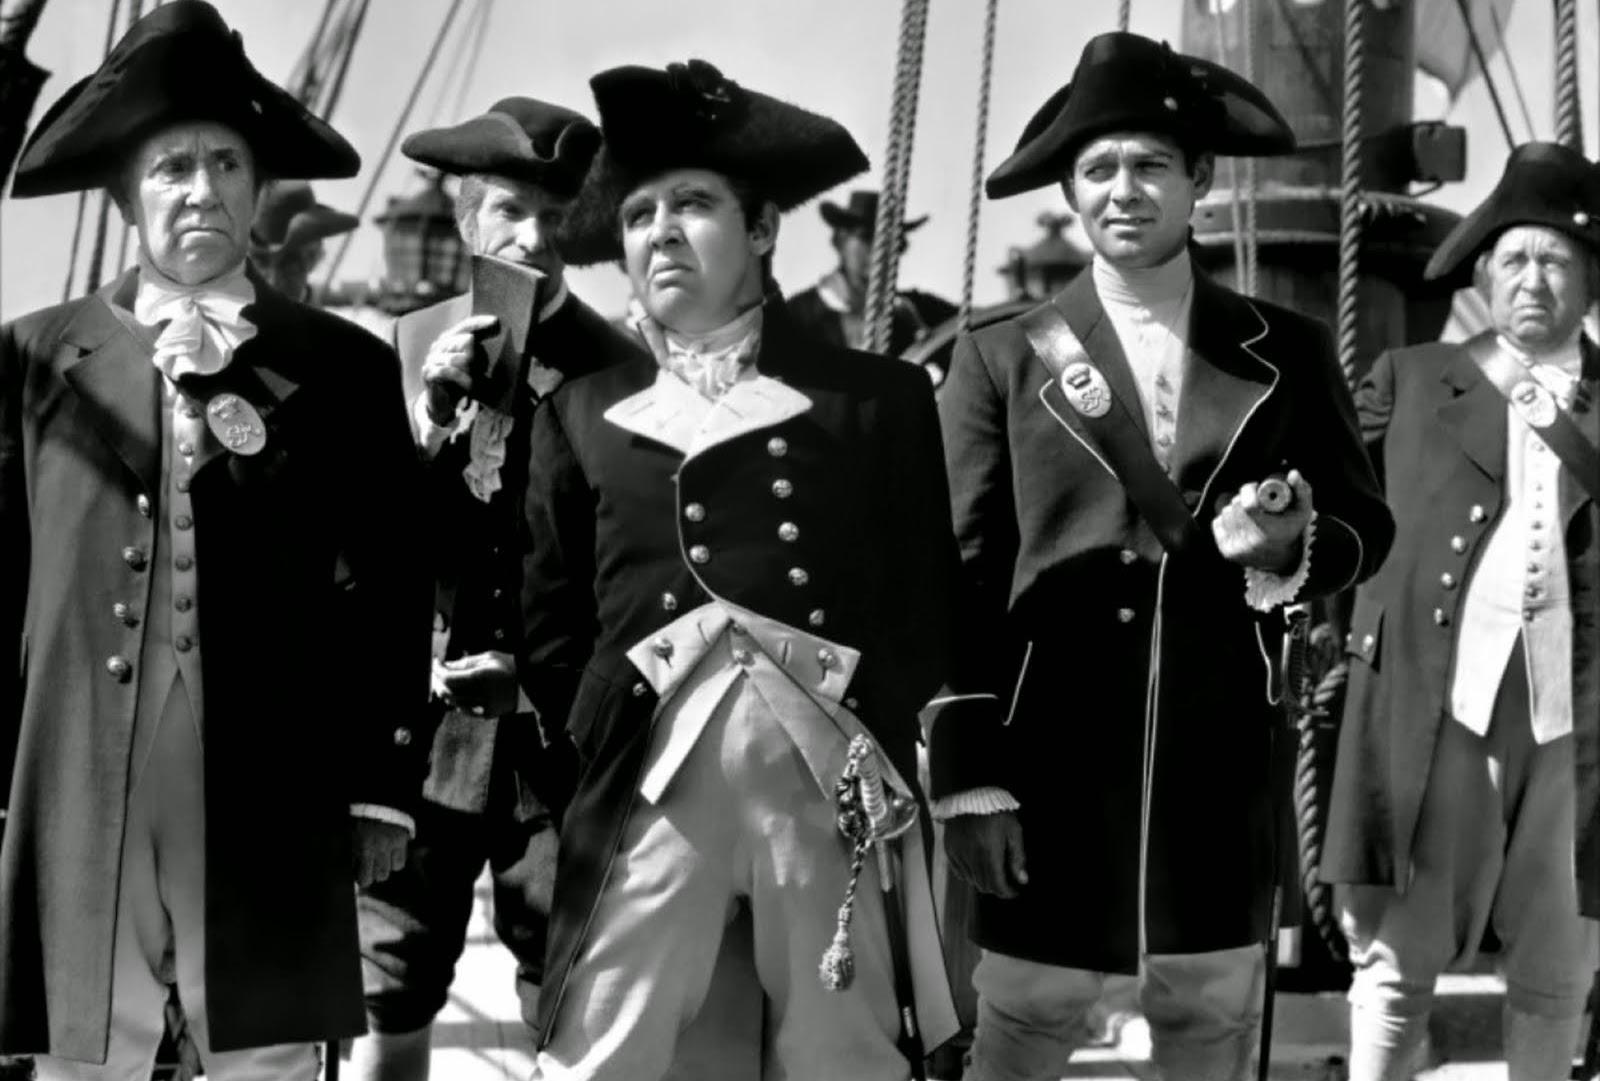 mutiny_on_the_bounty_1935_3.jpg